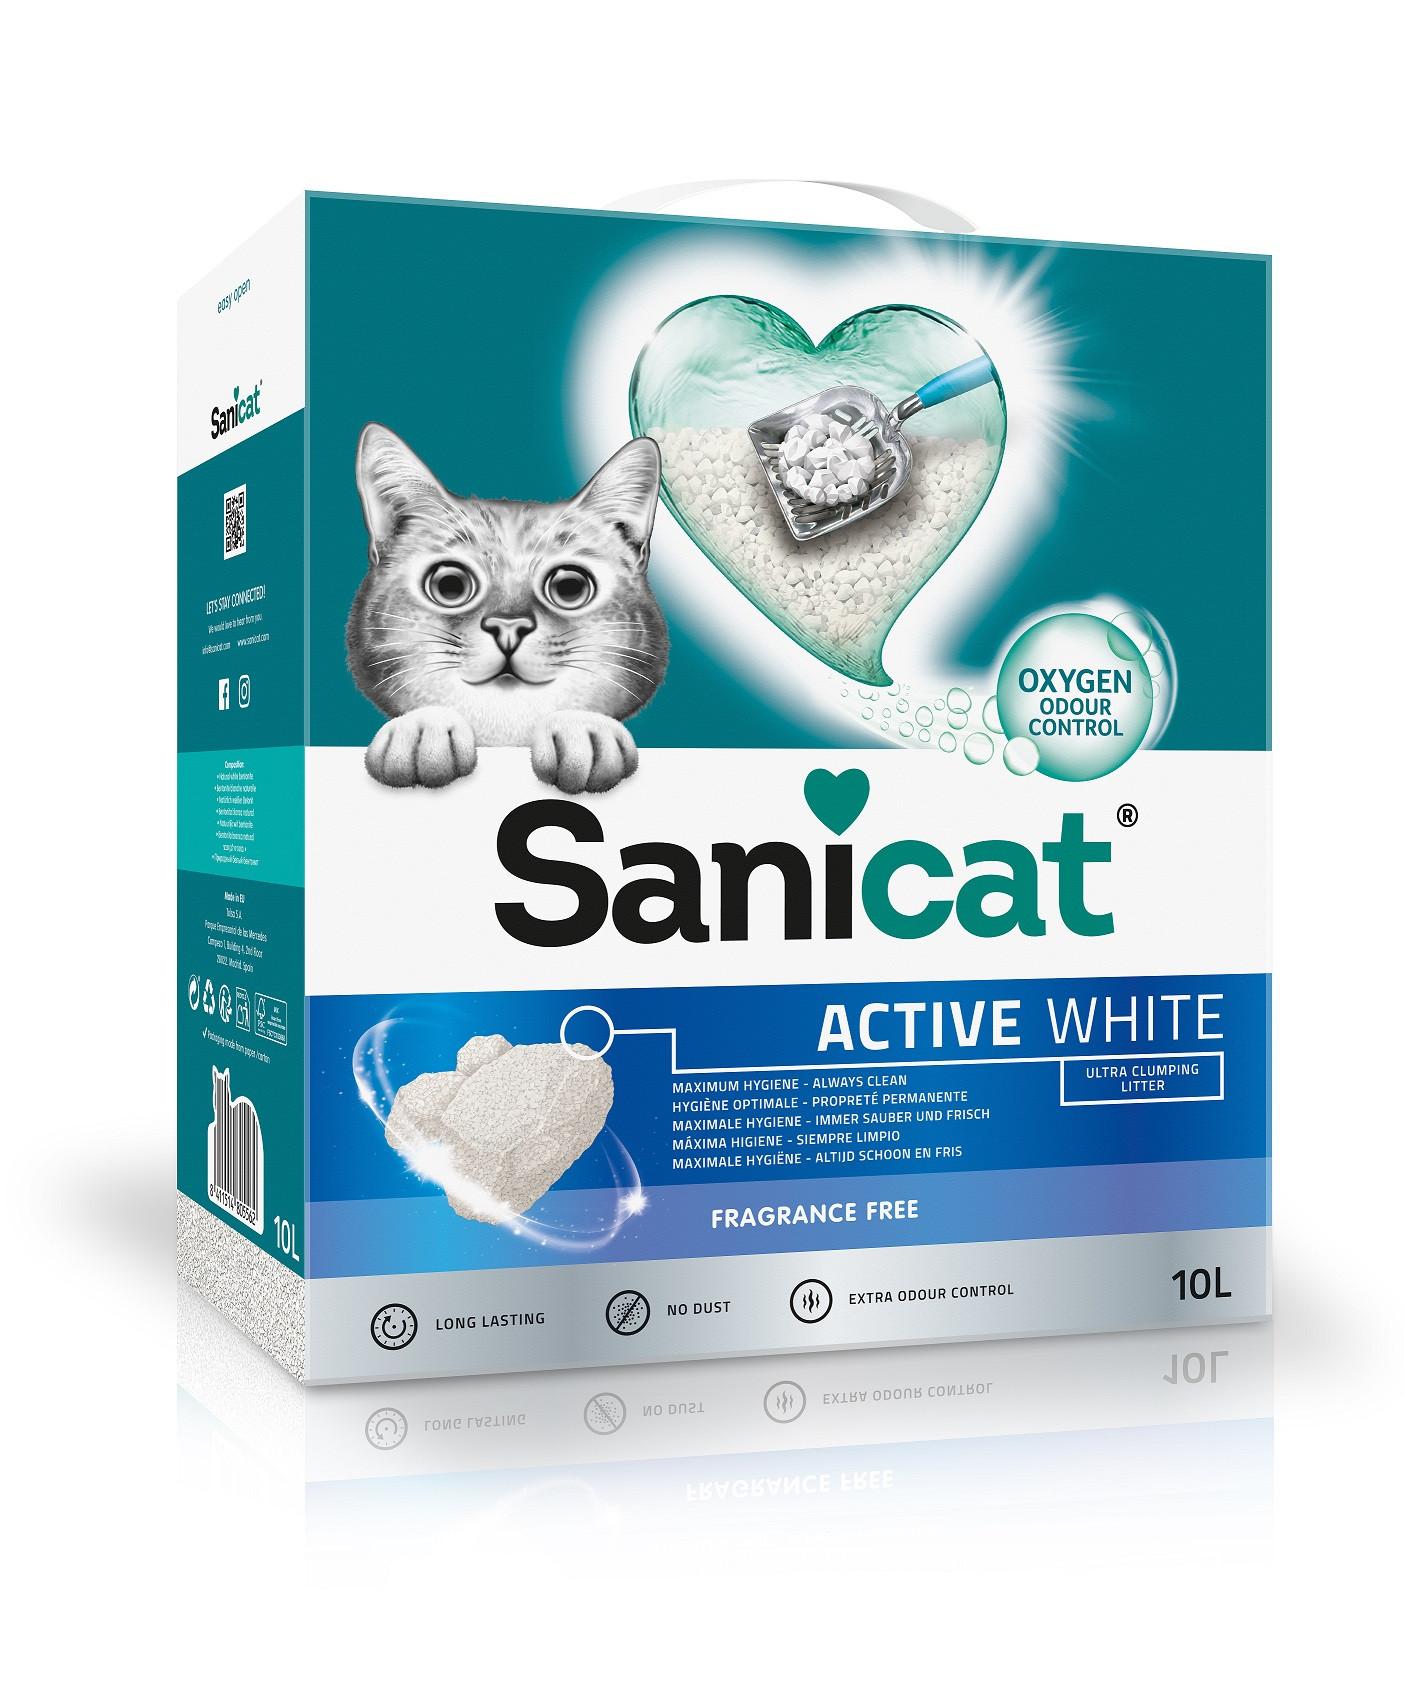 Sanicat Active White kattengrit